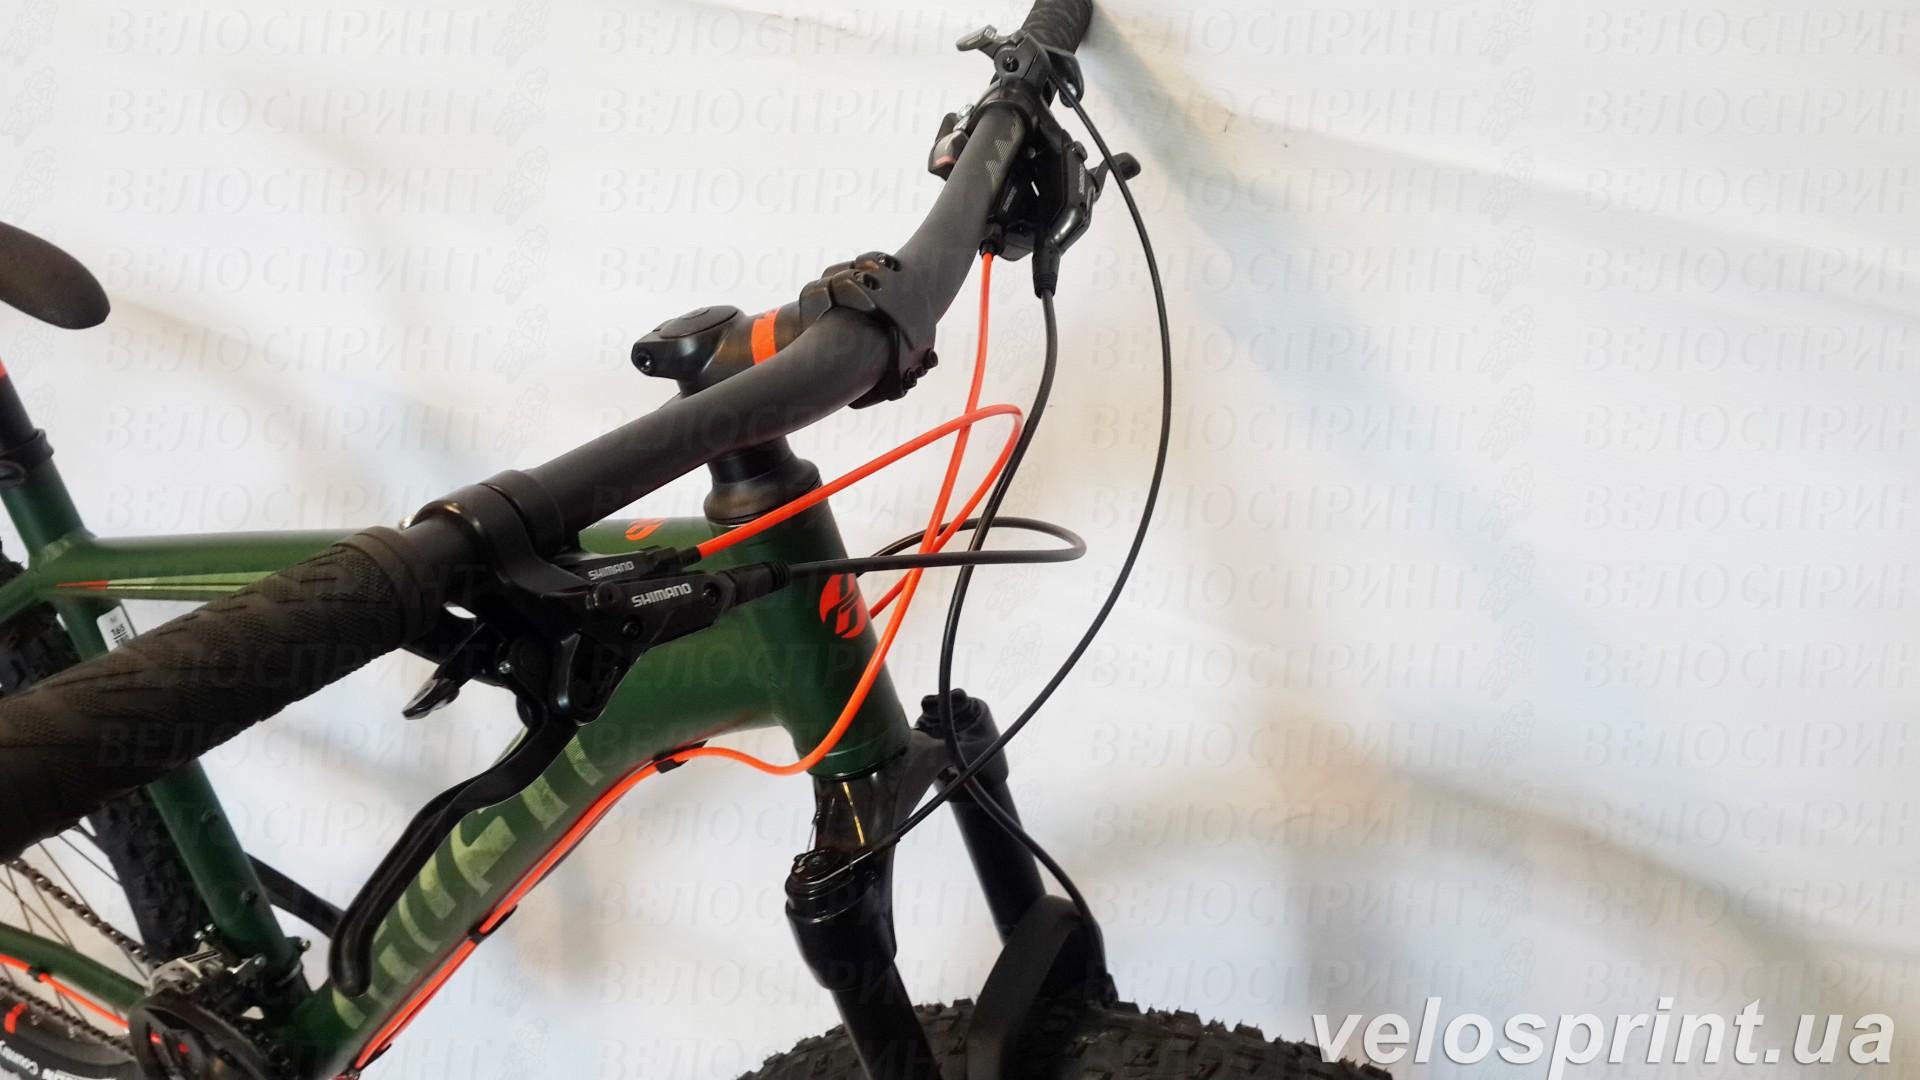 Велосипед GHOST Kato 2 AL 27.5 forestgreen/armygreen/neonred руль год 2017